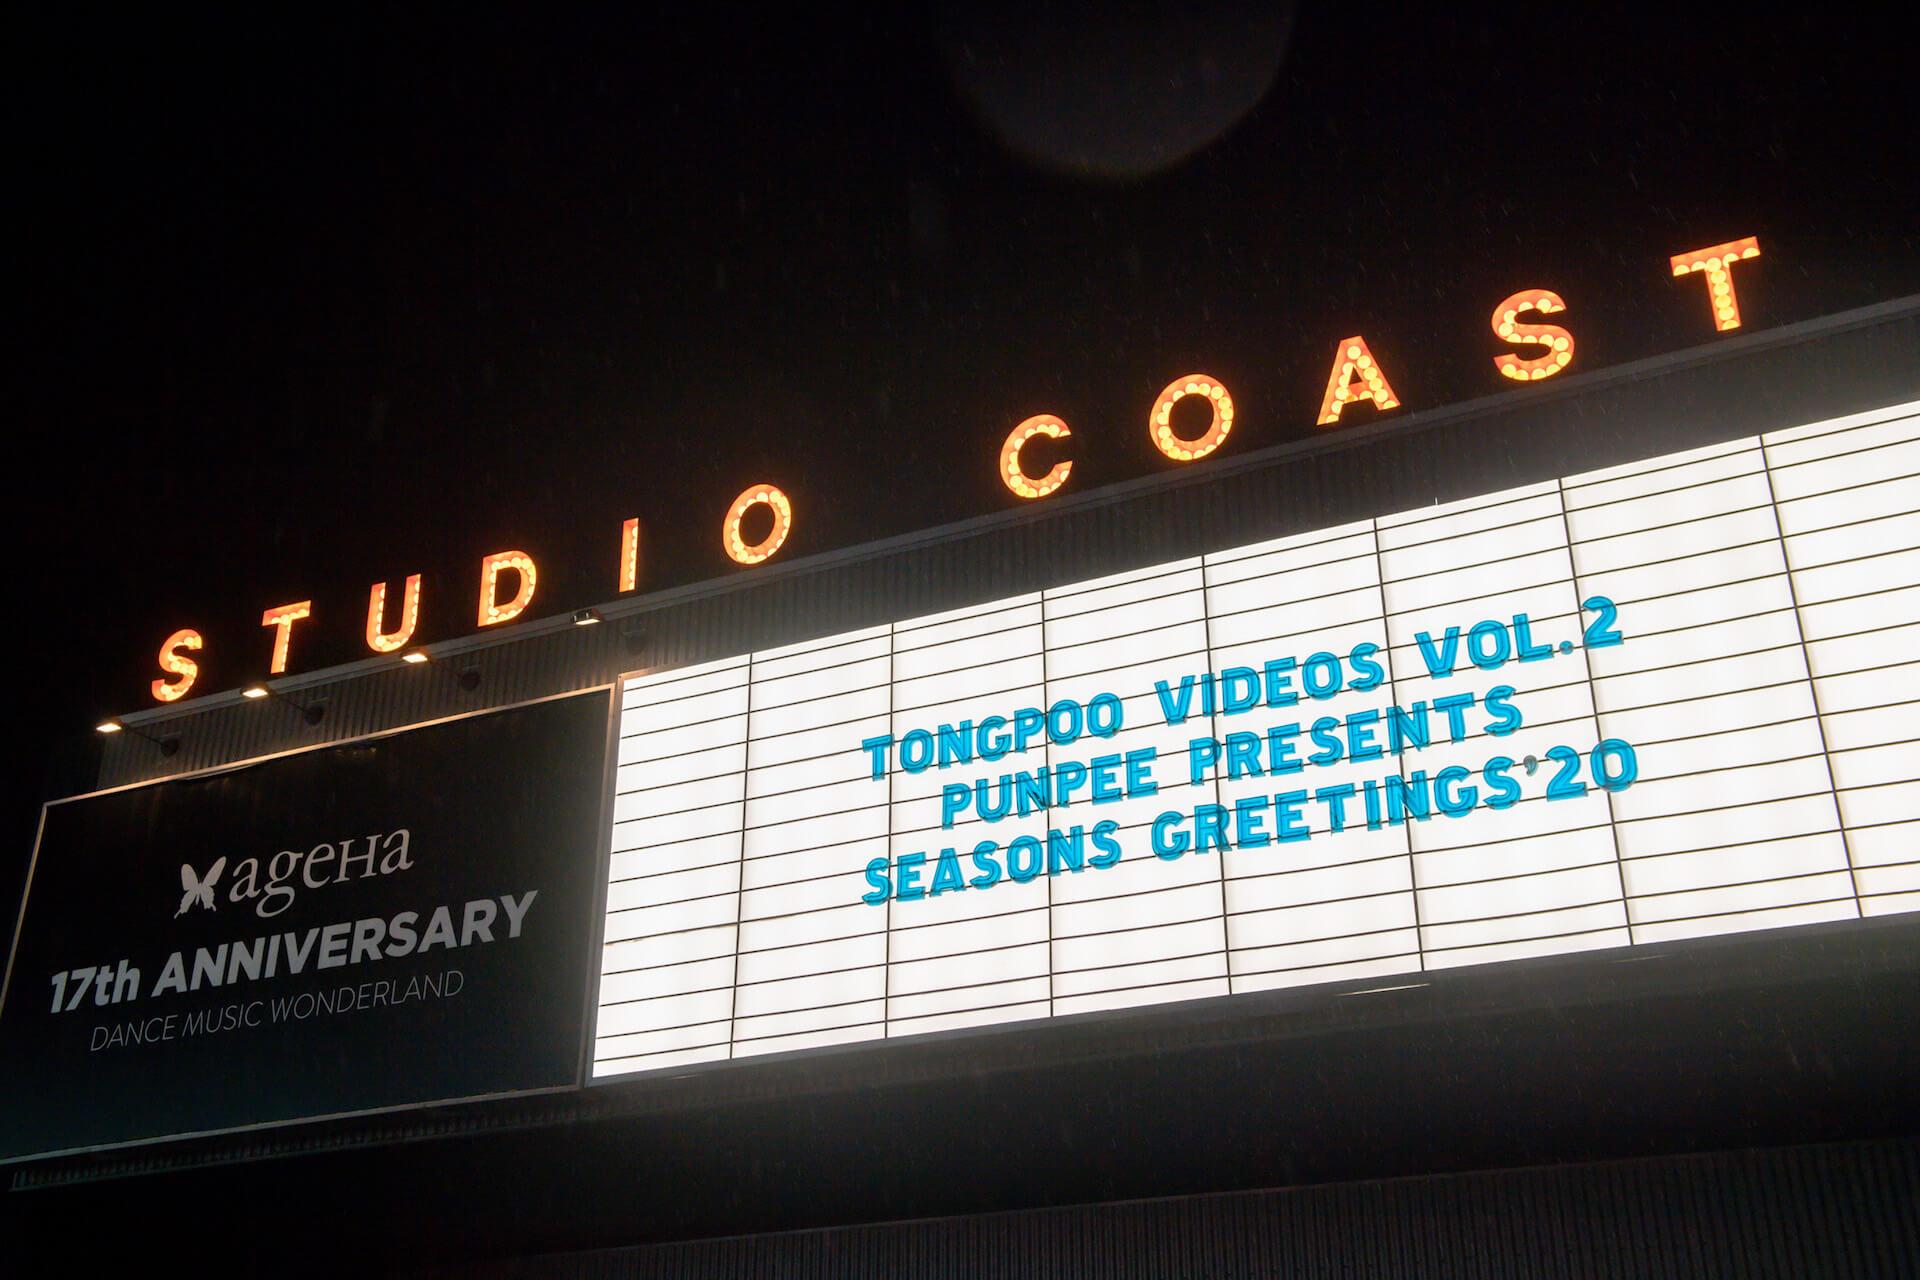 PUNPEE<Seasons Greetings'20>がTongpooにて独占配信決定!PUNPEEからコメントも「いつものメンツと慰安旅行的な感じです」 music201109_punpee_live_1